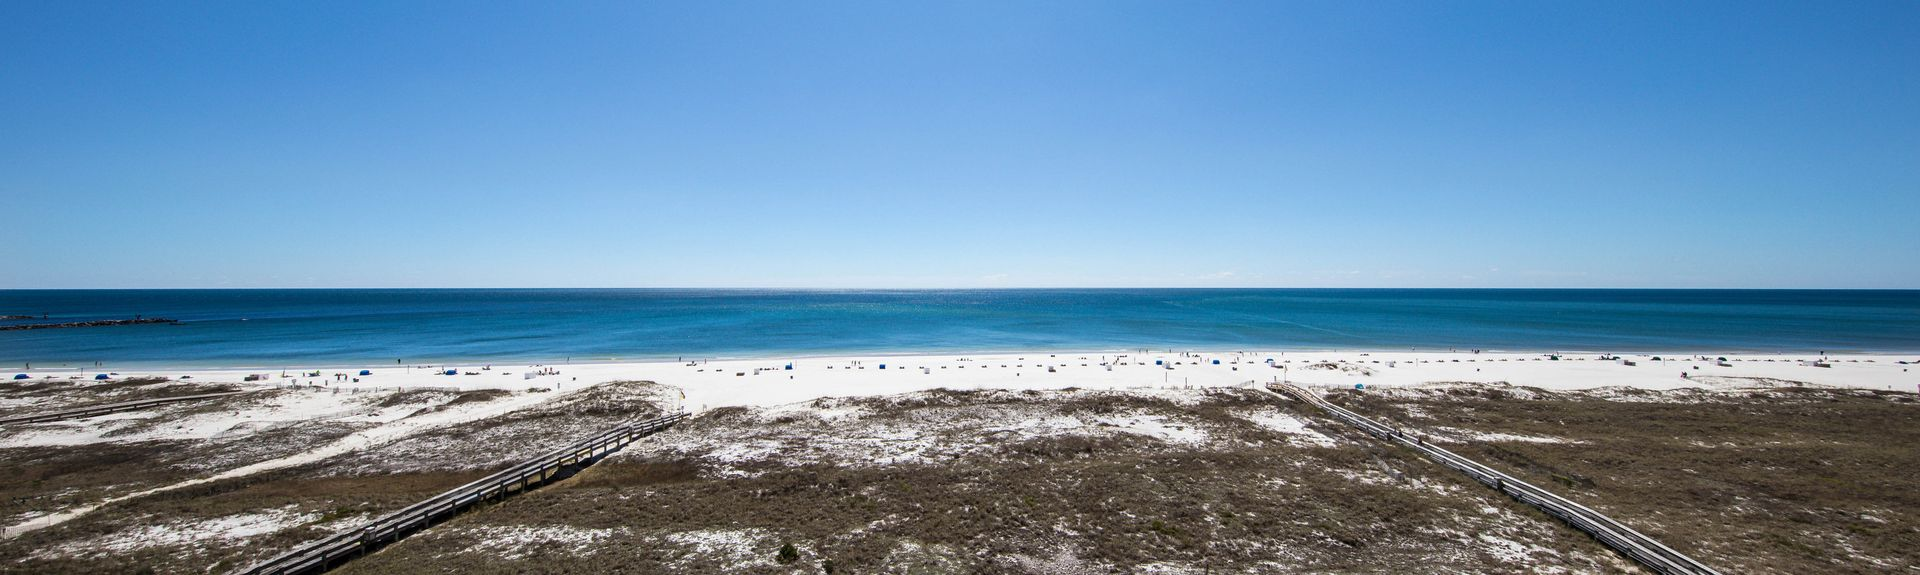 Phoenix VII, Orange Beach, Alabama, United States of America